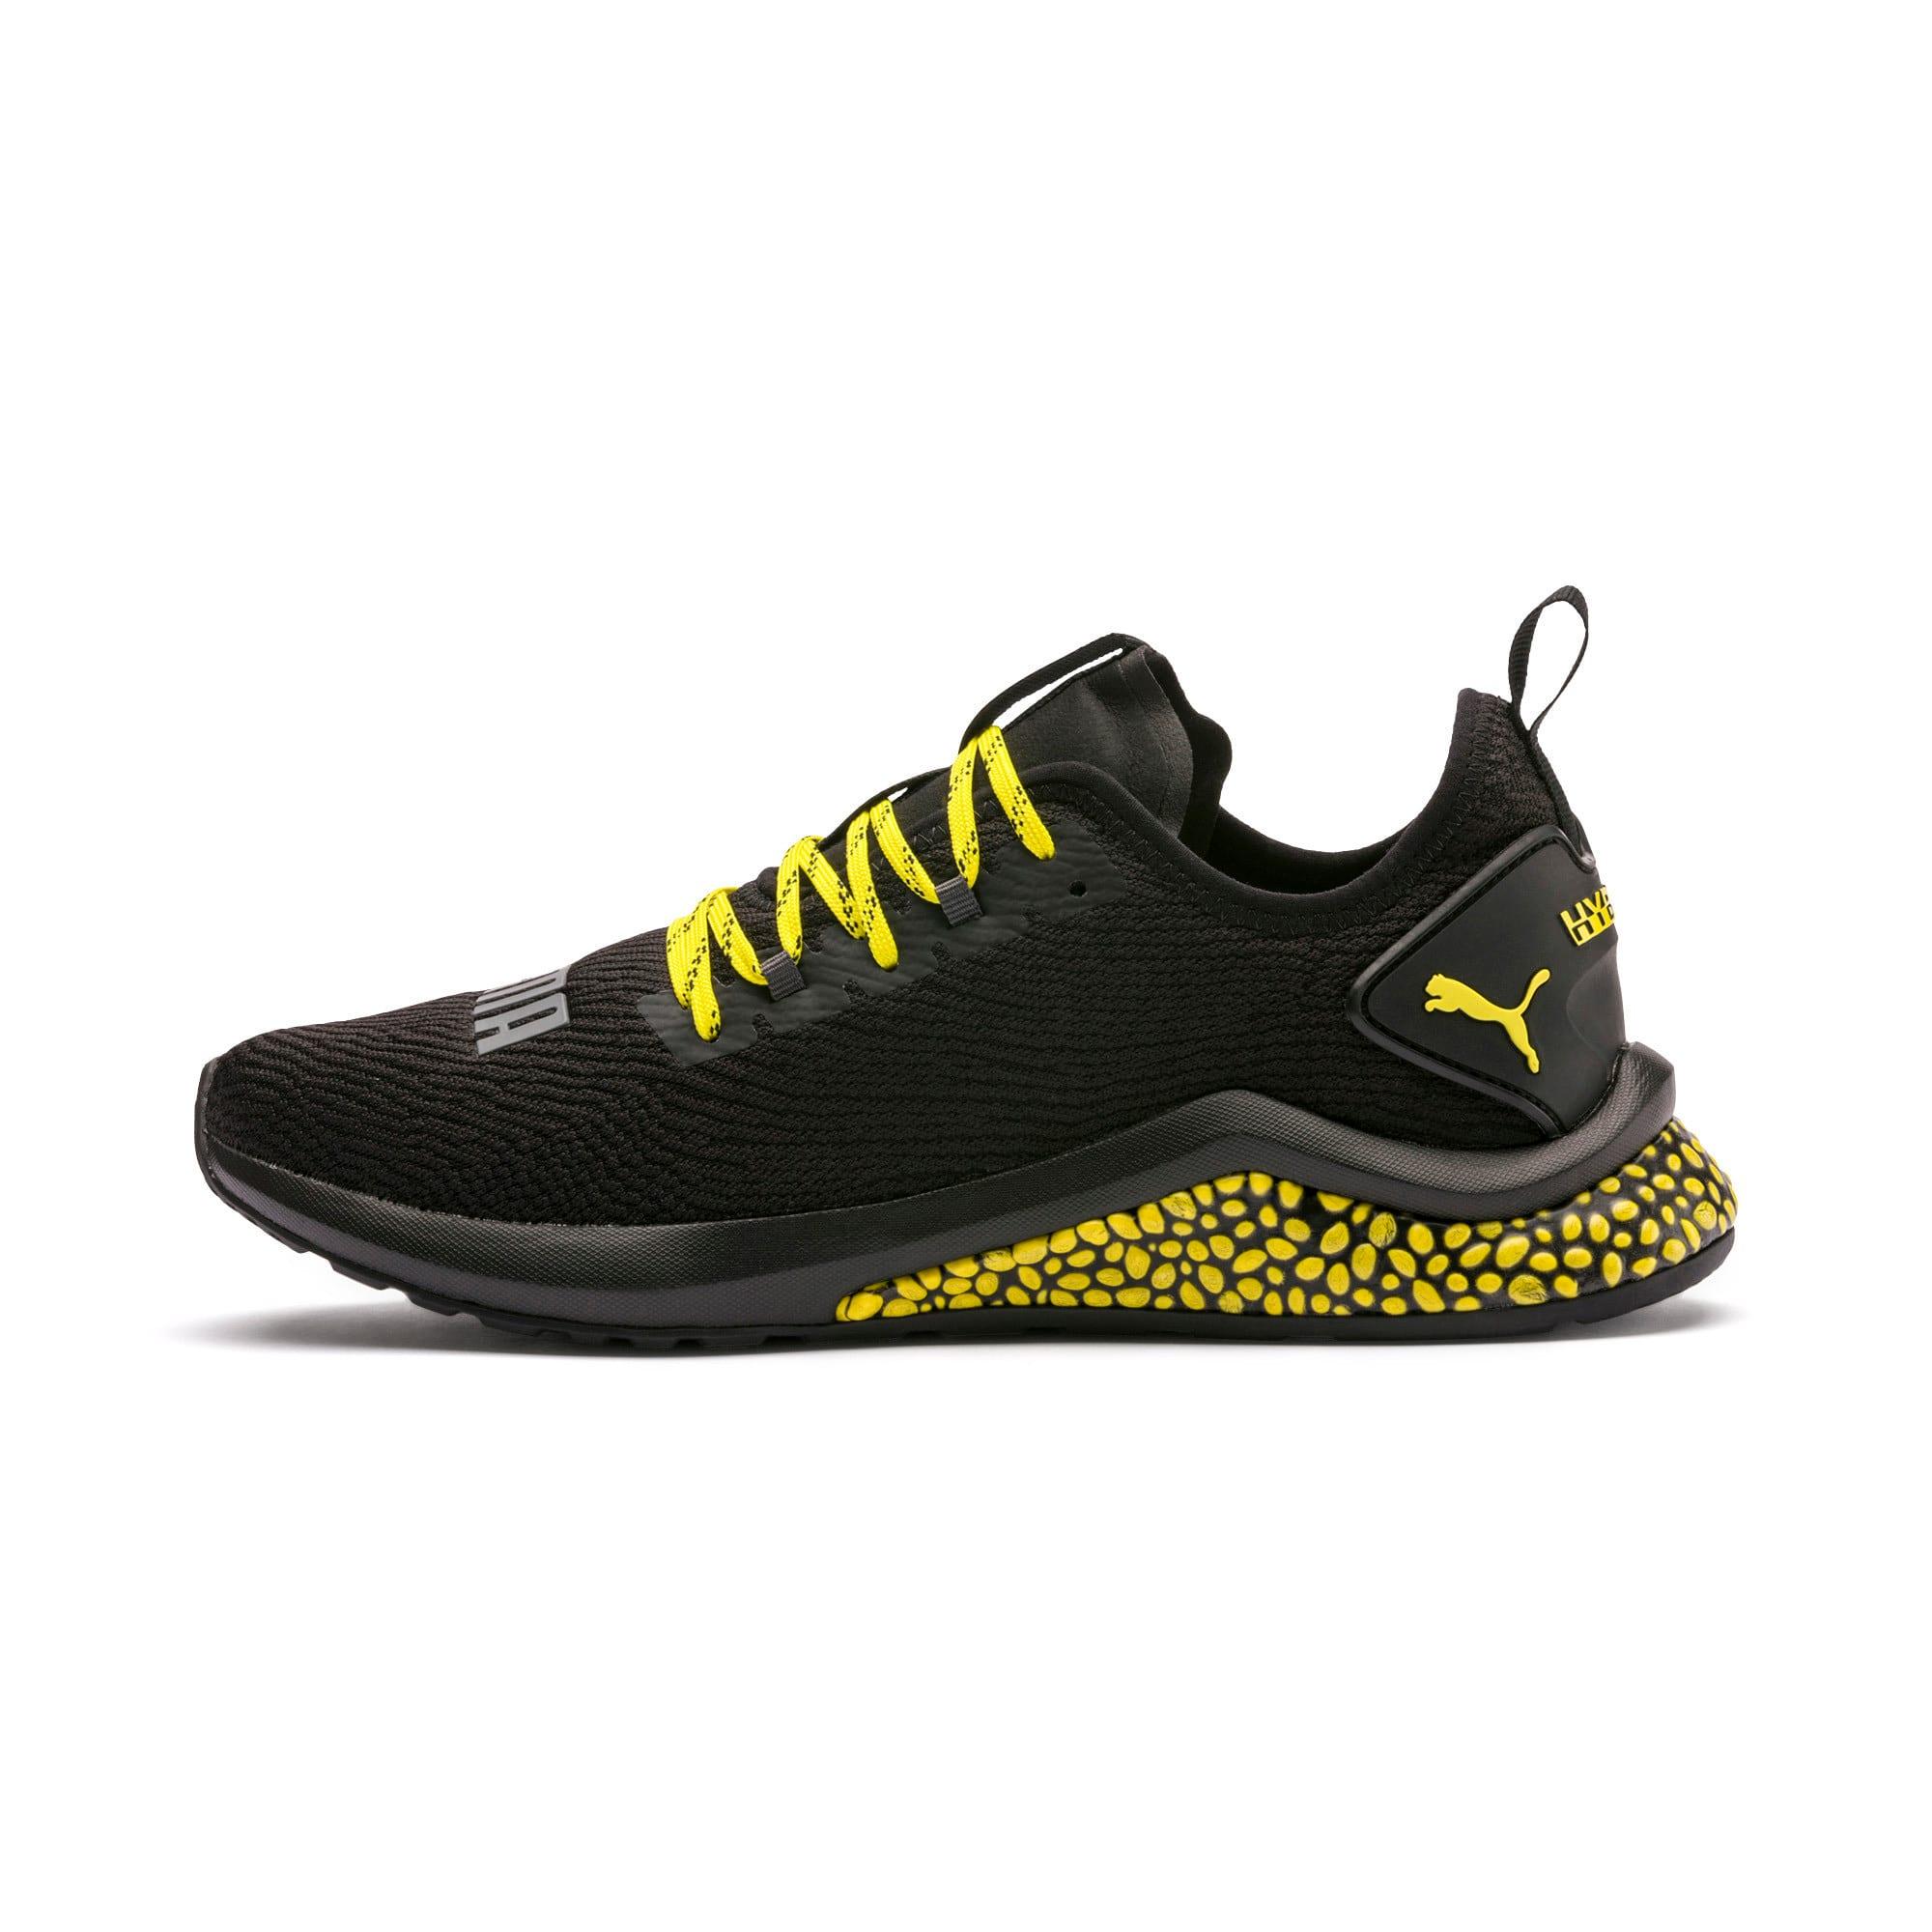 Thumbnail 1 of HYBRID NX Caution hardloopschoenen voor heren, Puma Black-Blazing Yellow, medium